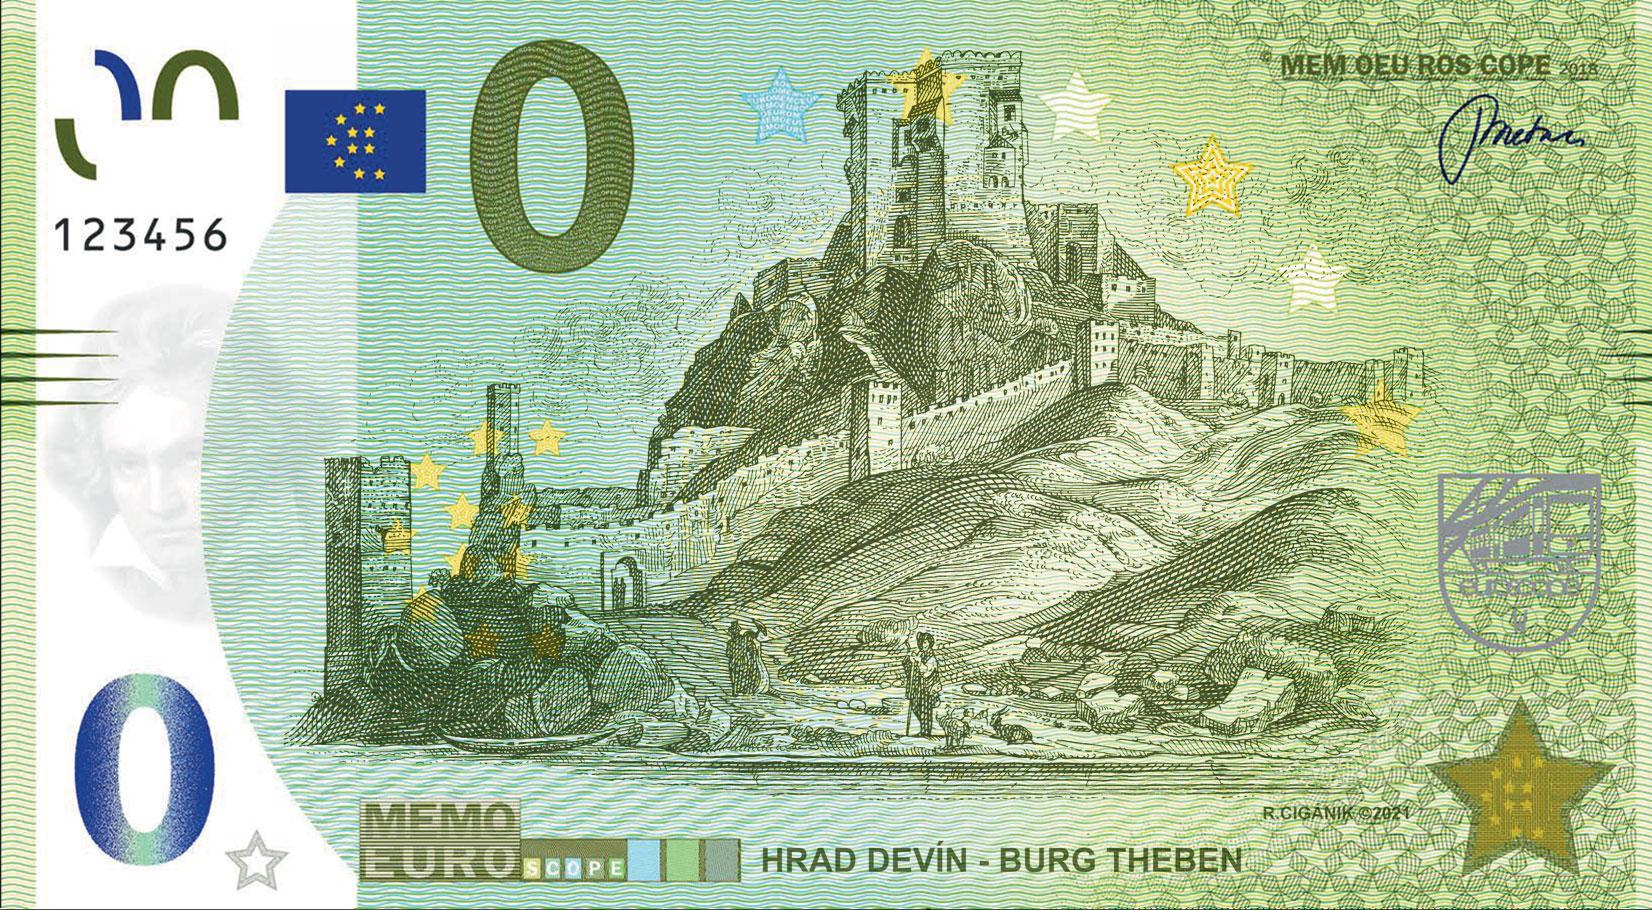 133_16_Hrad_Devin-front